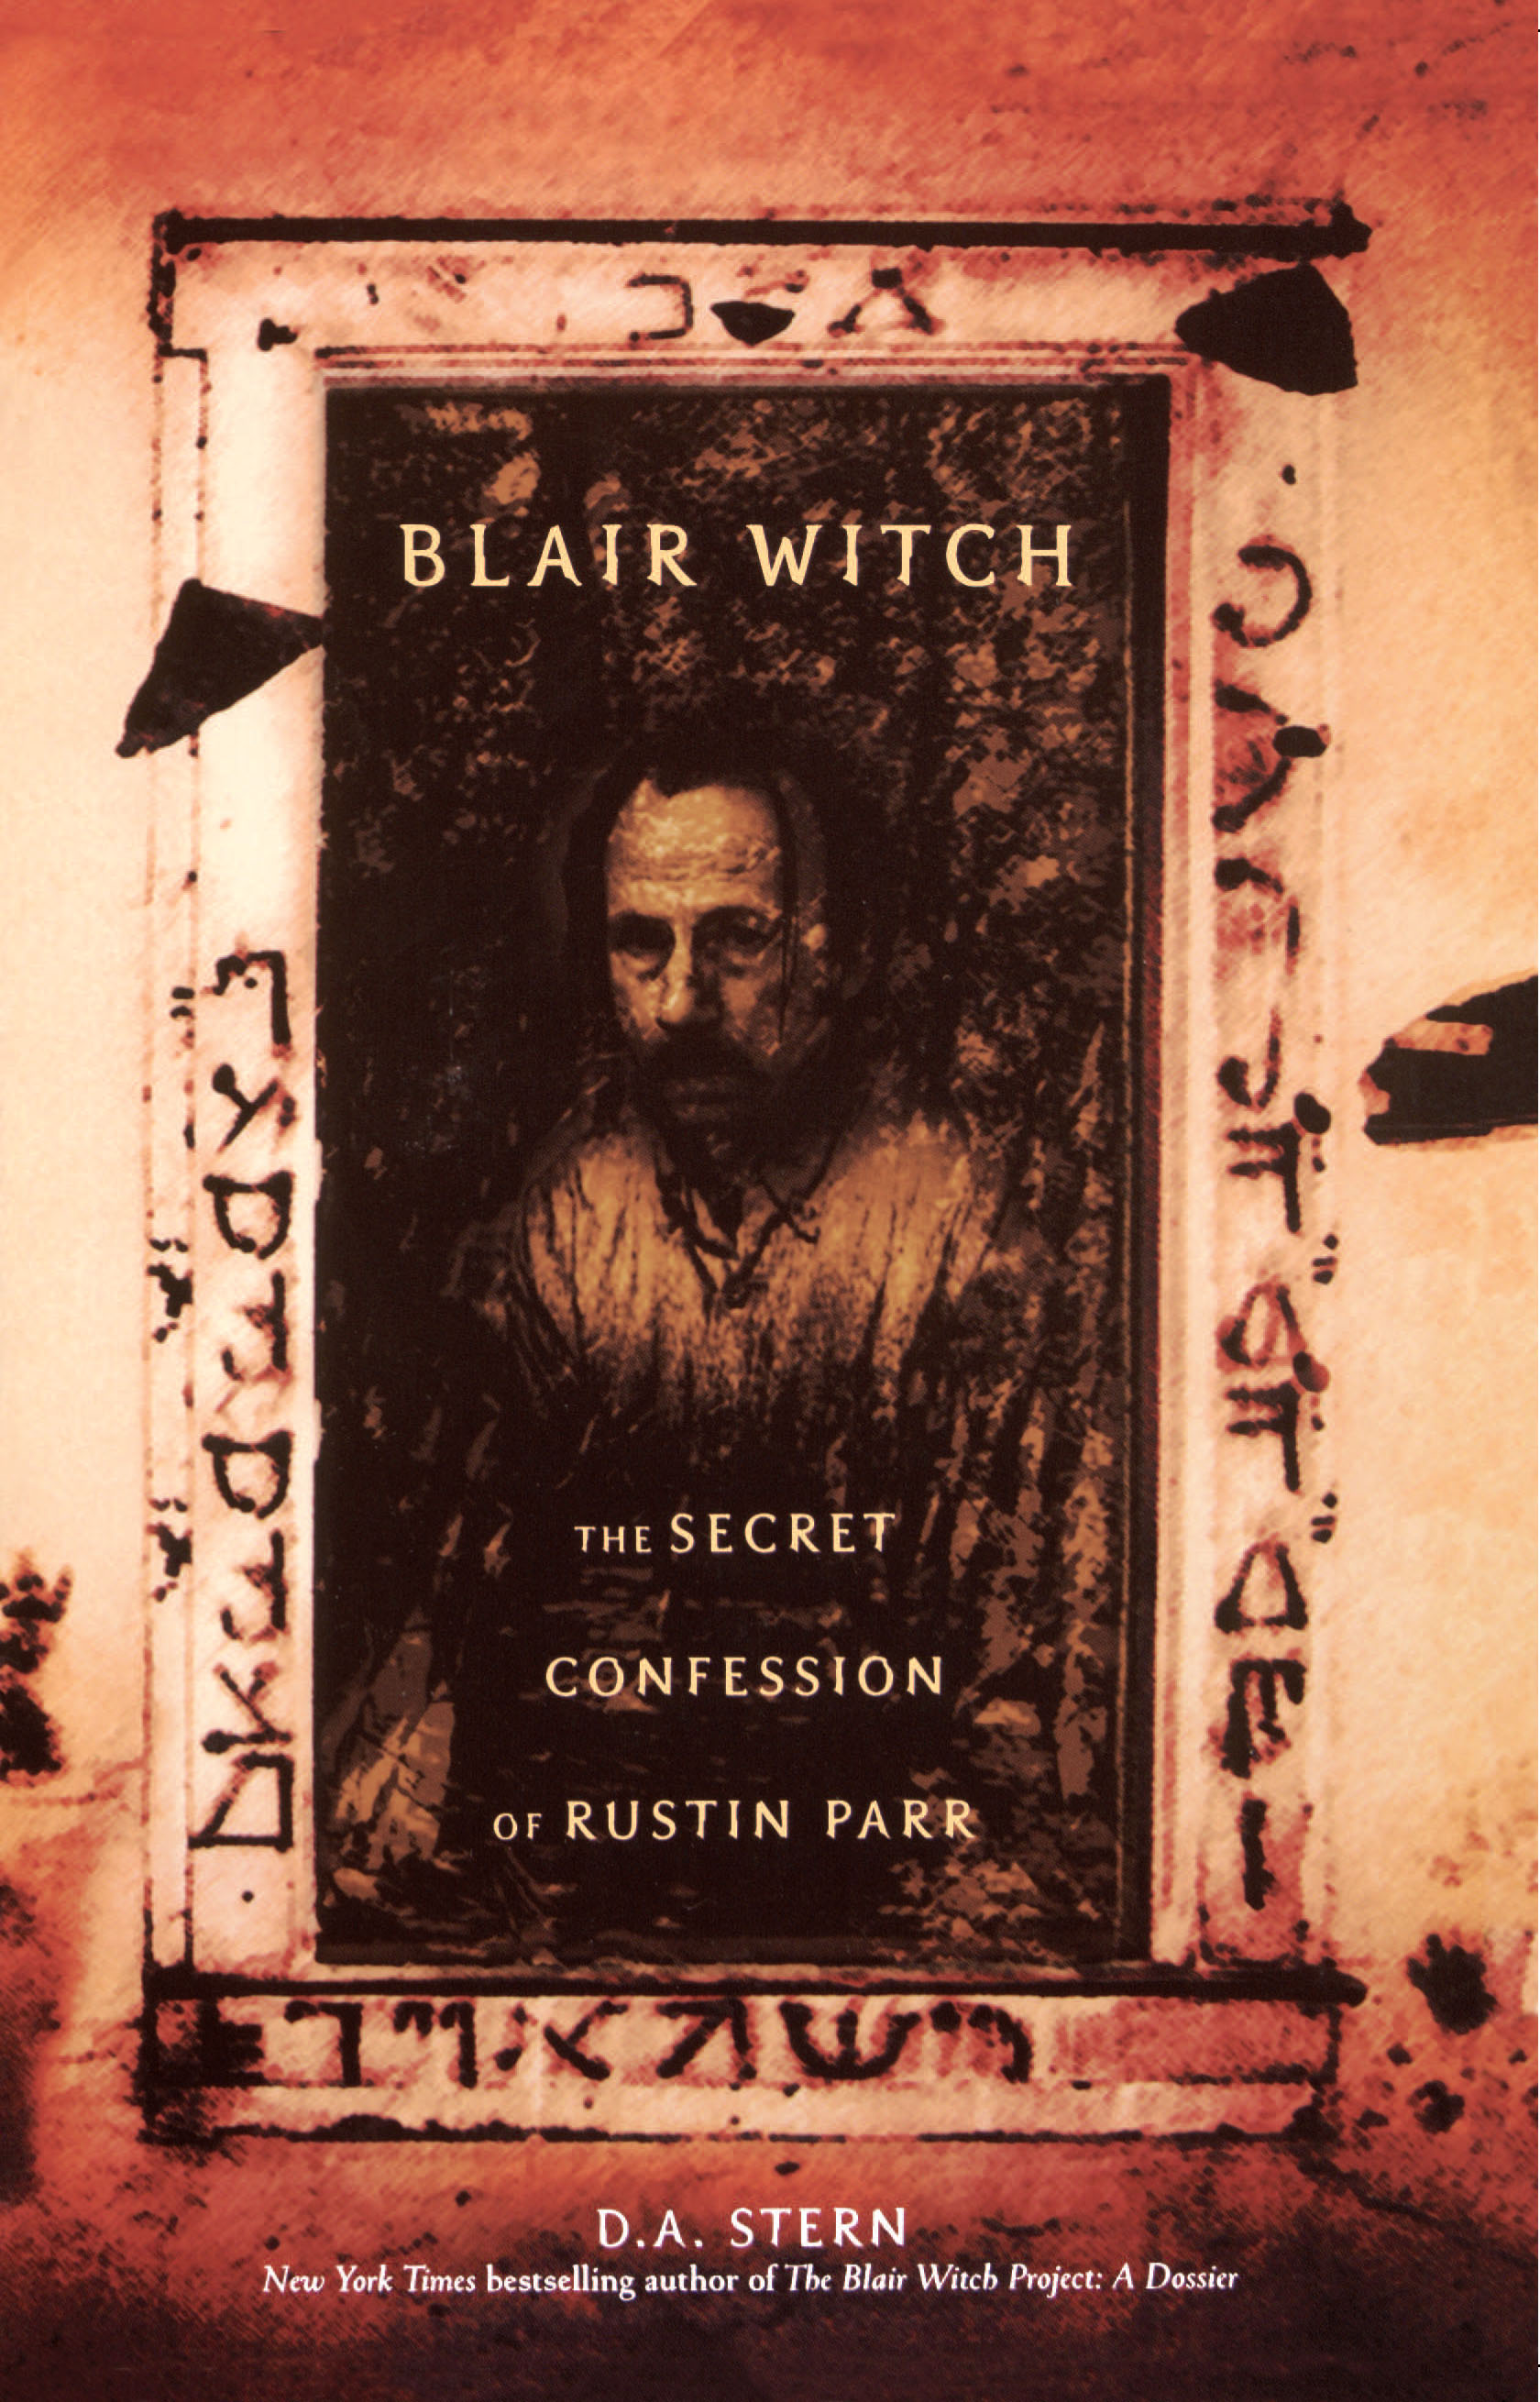 Cvr9780743411530 9780743411530 hr Blair Witch The Secret